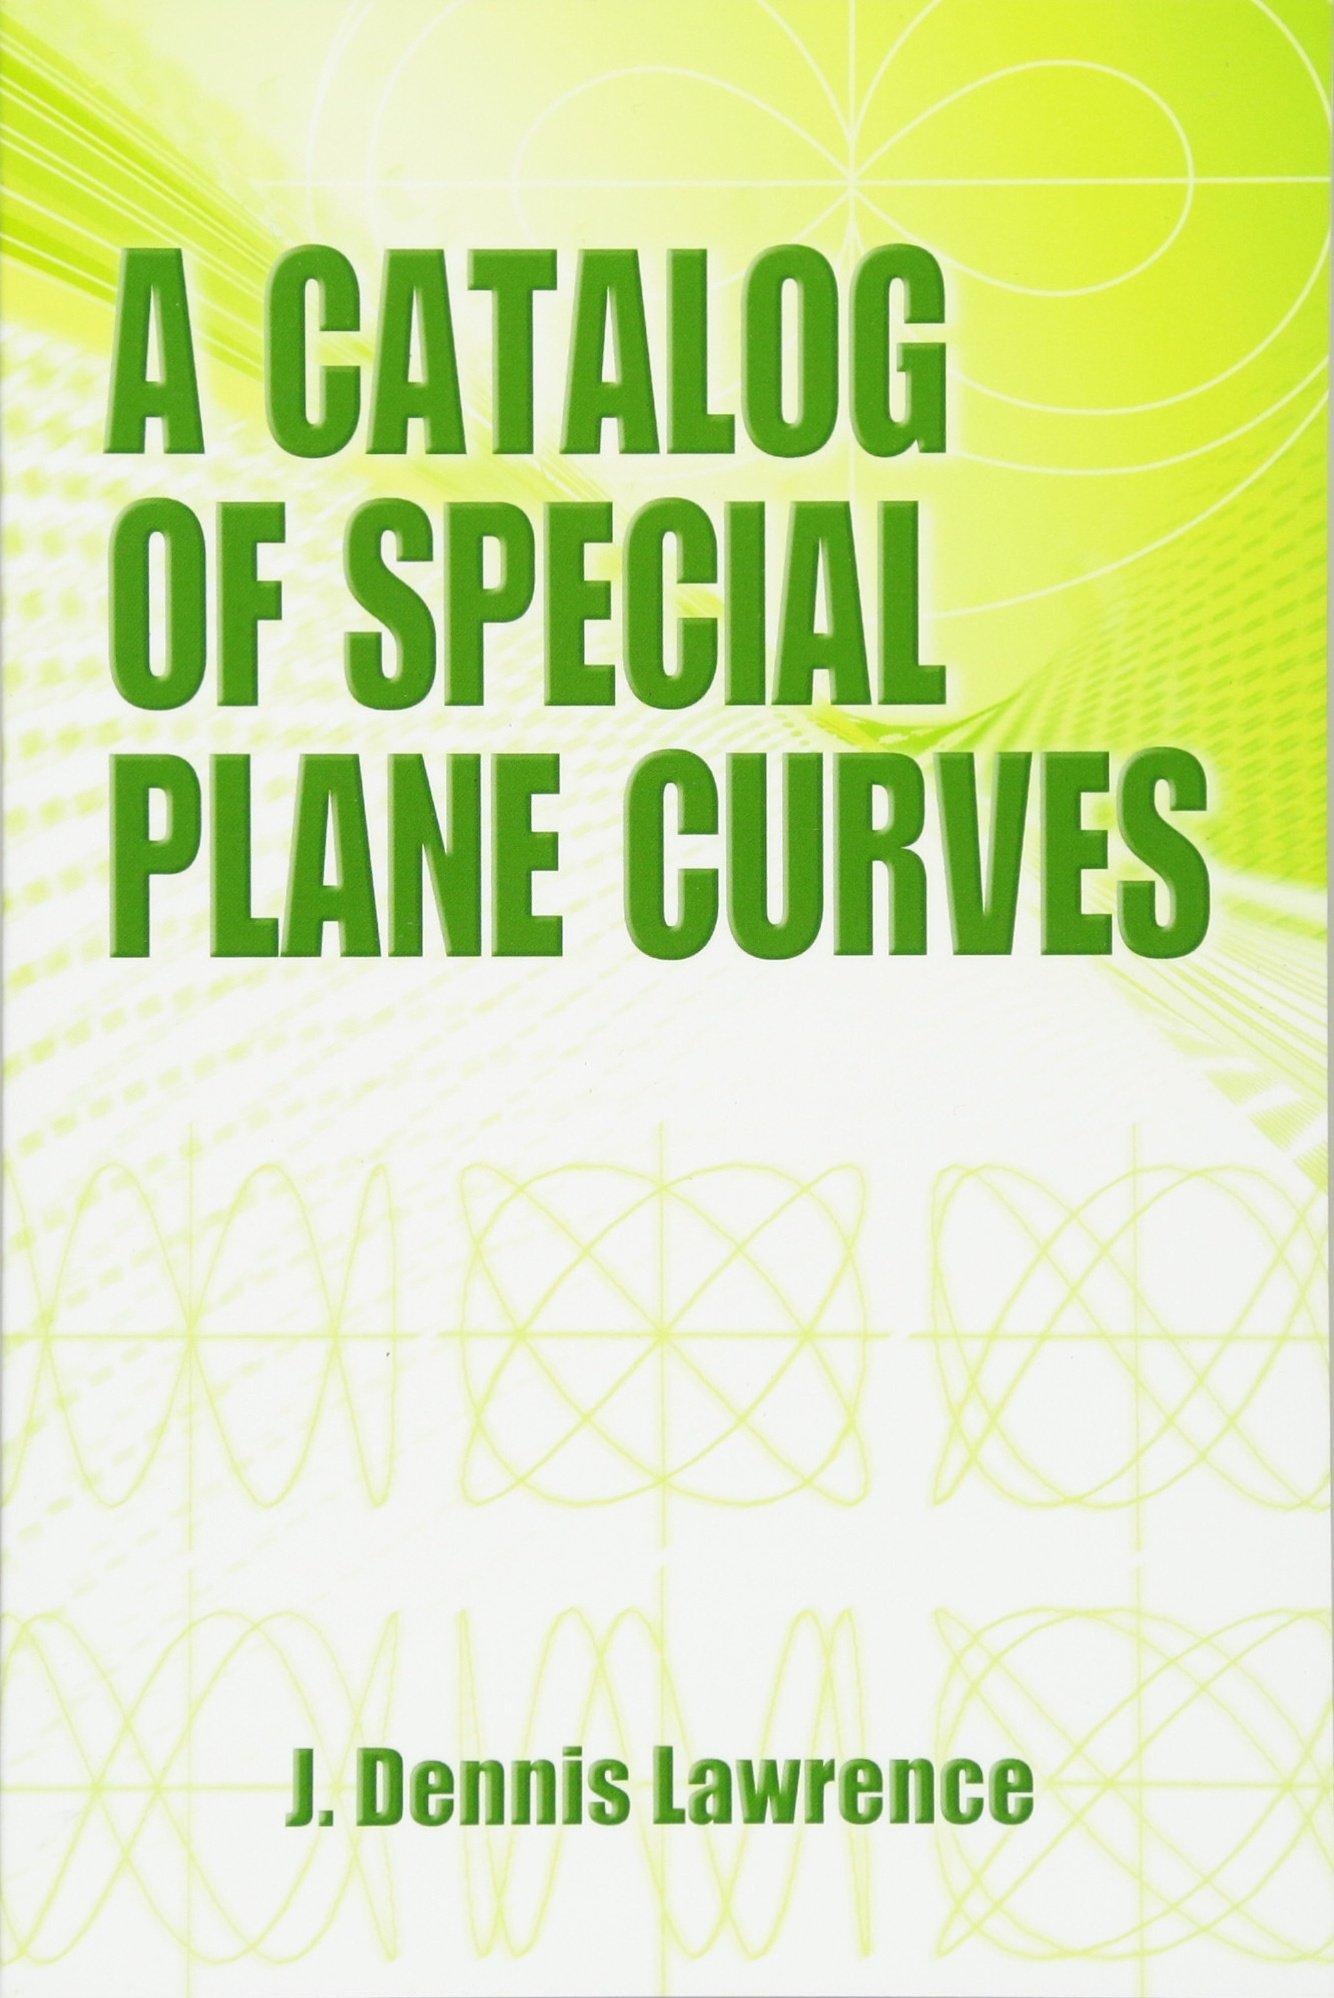 A Catalog of Special Plane Curves Dover Books on Mathematics: Amazon.es: Lawrence, J. Dennis: Libros en idiomas extranjeros